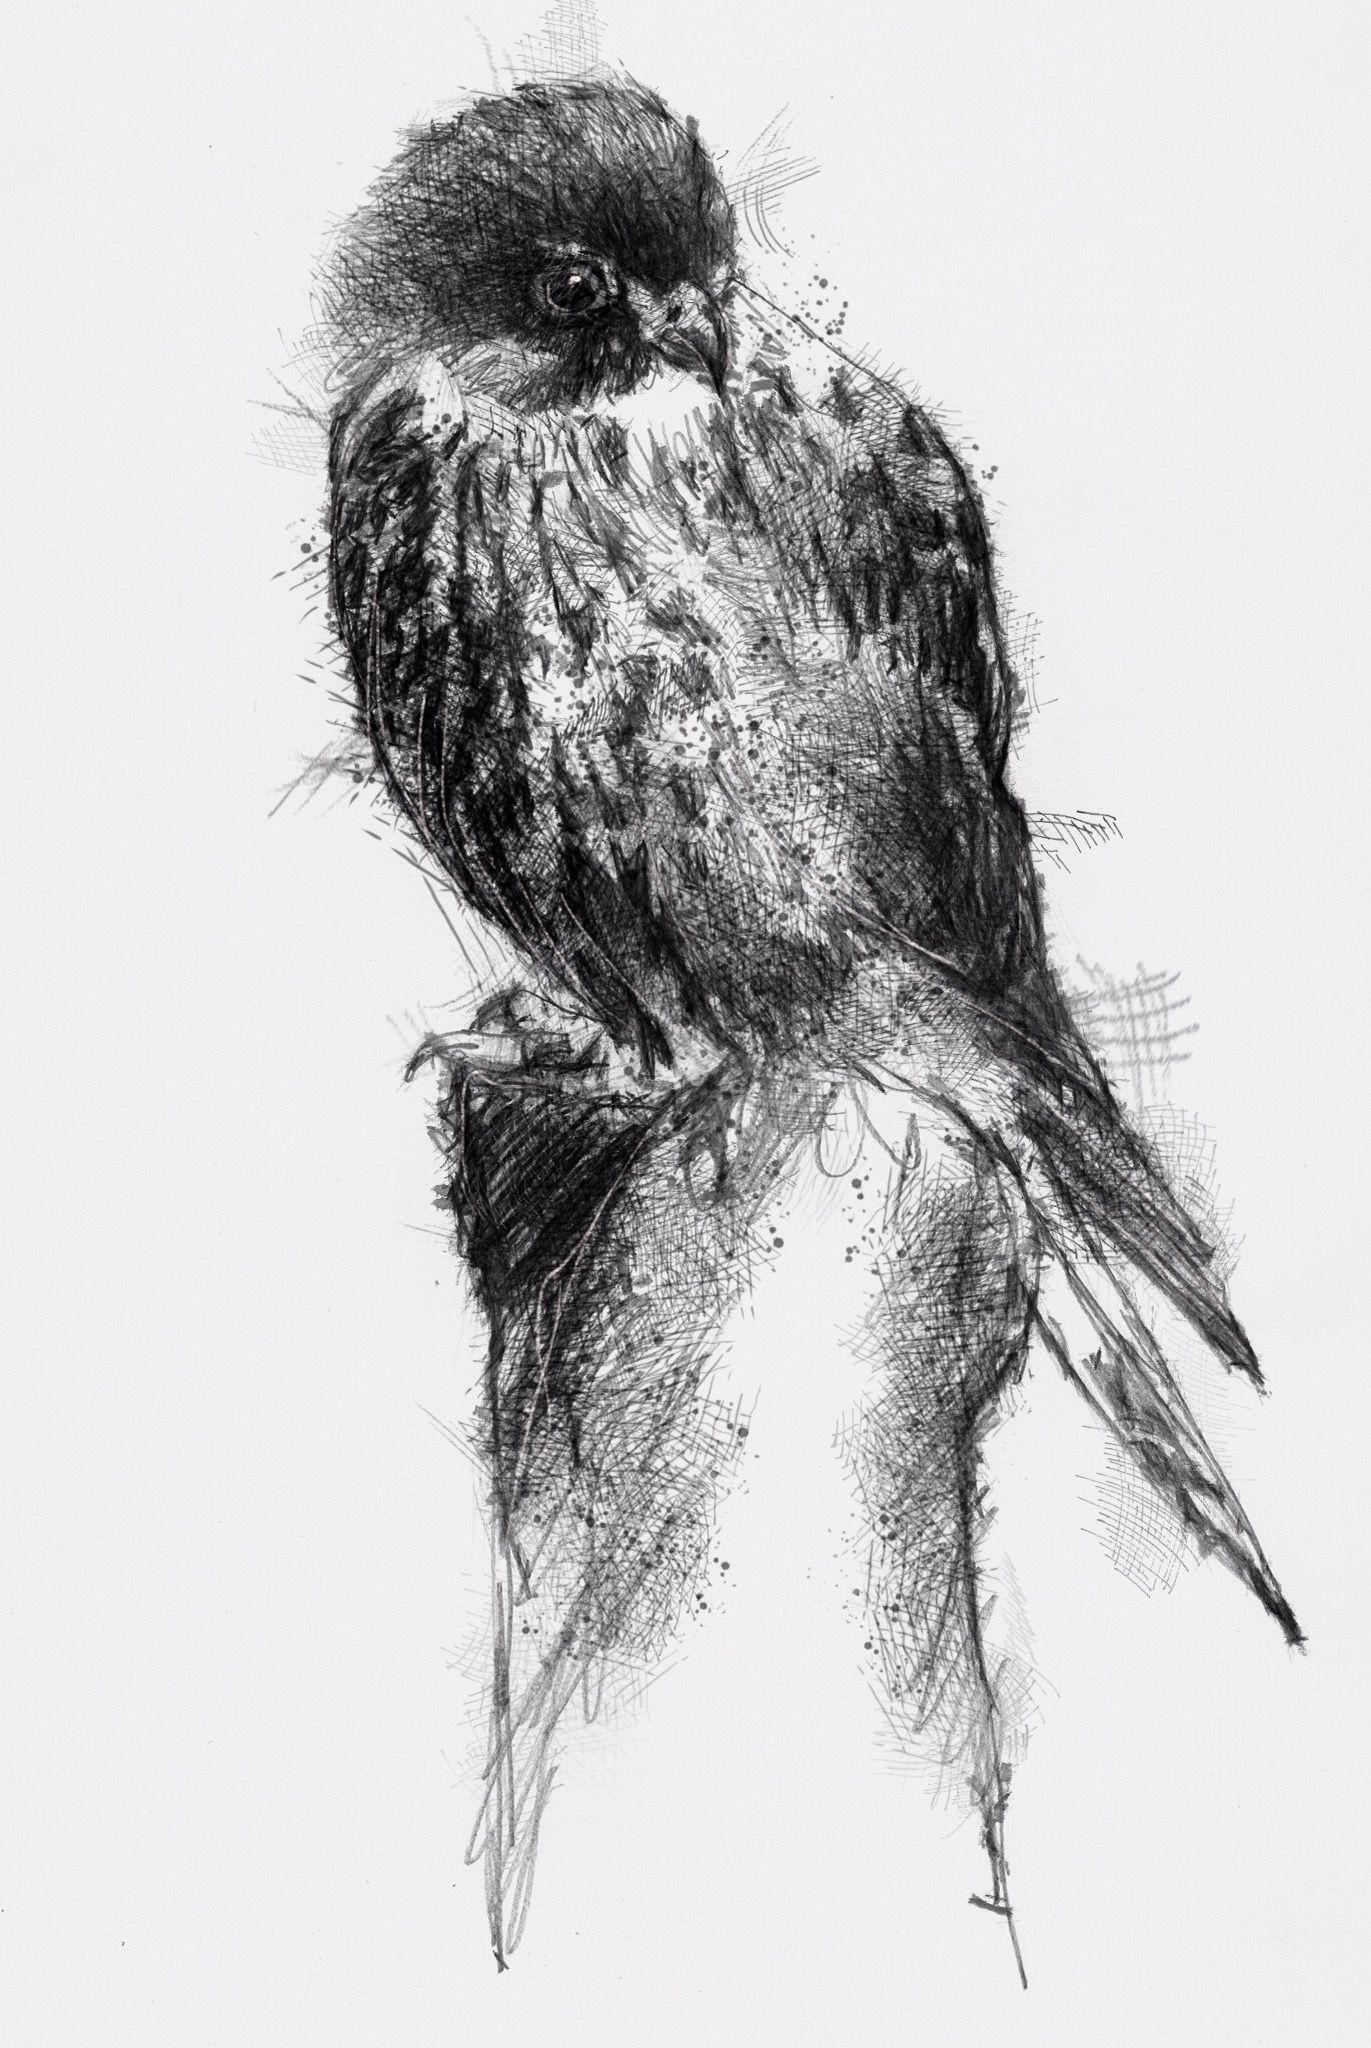 Drawing birds drawing animals bird drawings watercolor drawing animal drawings drawing